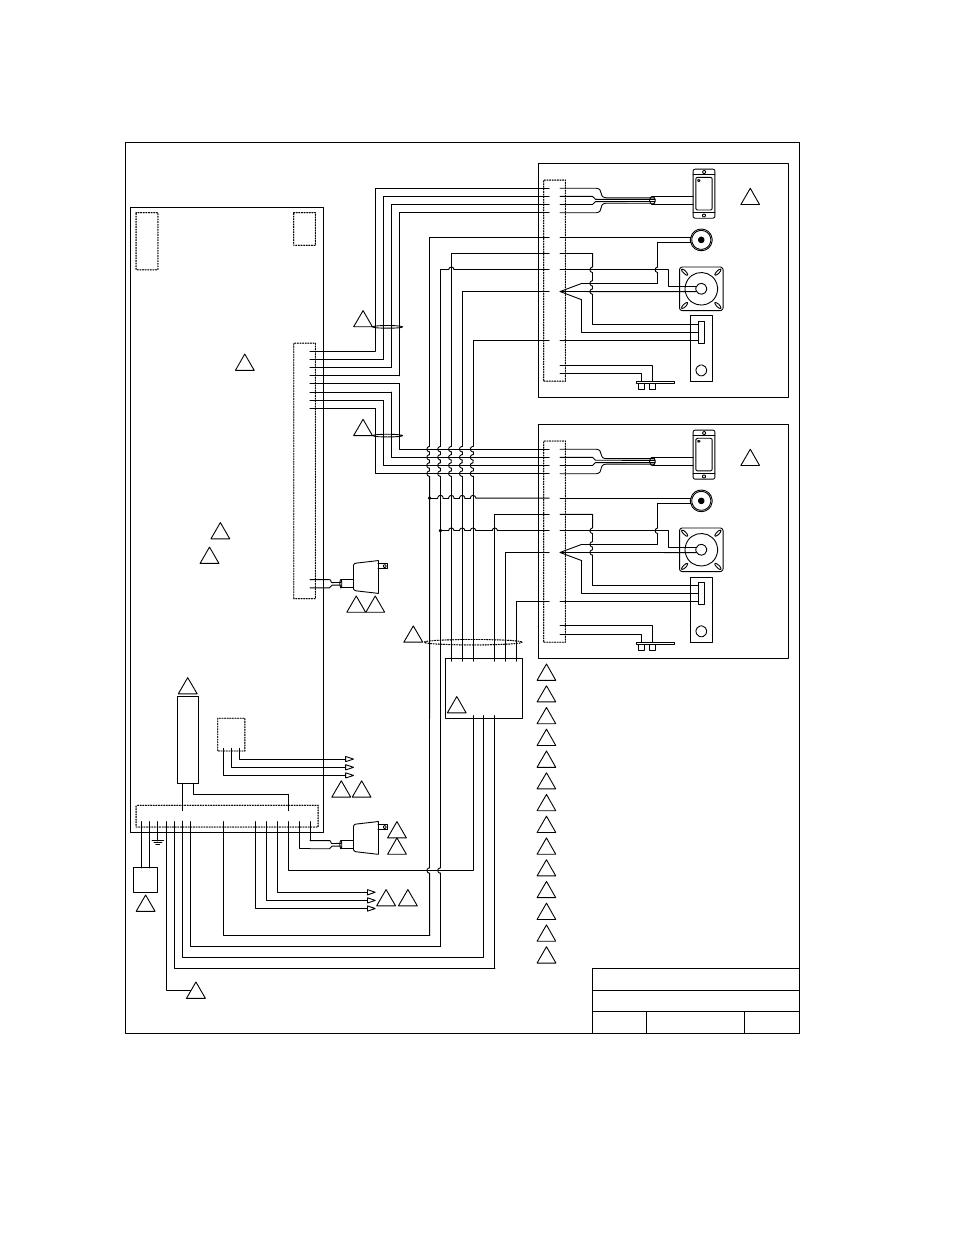 Door King 1838 Wiring Diagrams : 30 Wiring Diagram Images